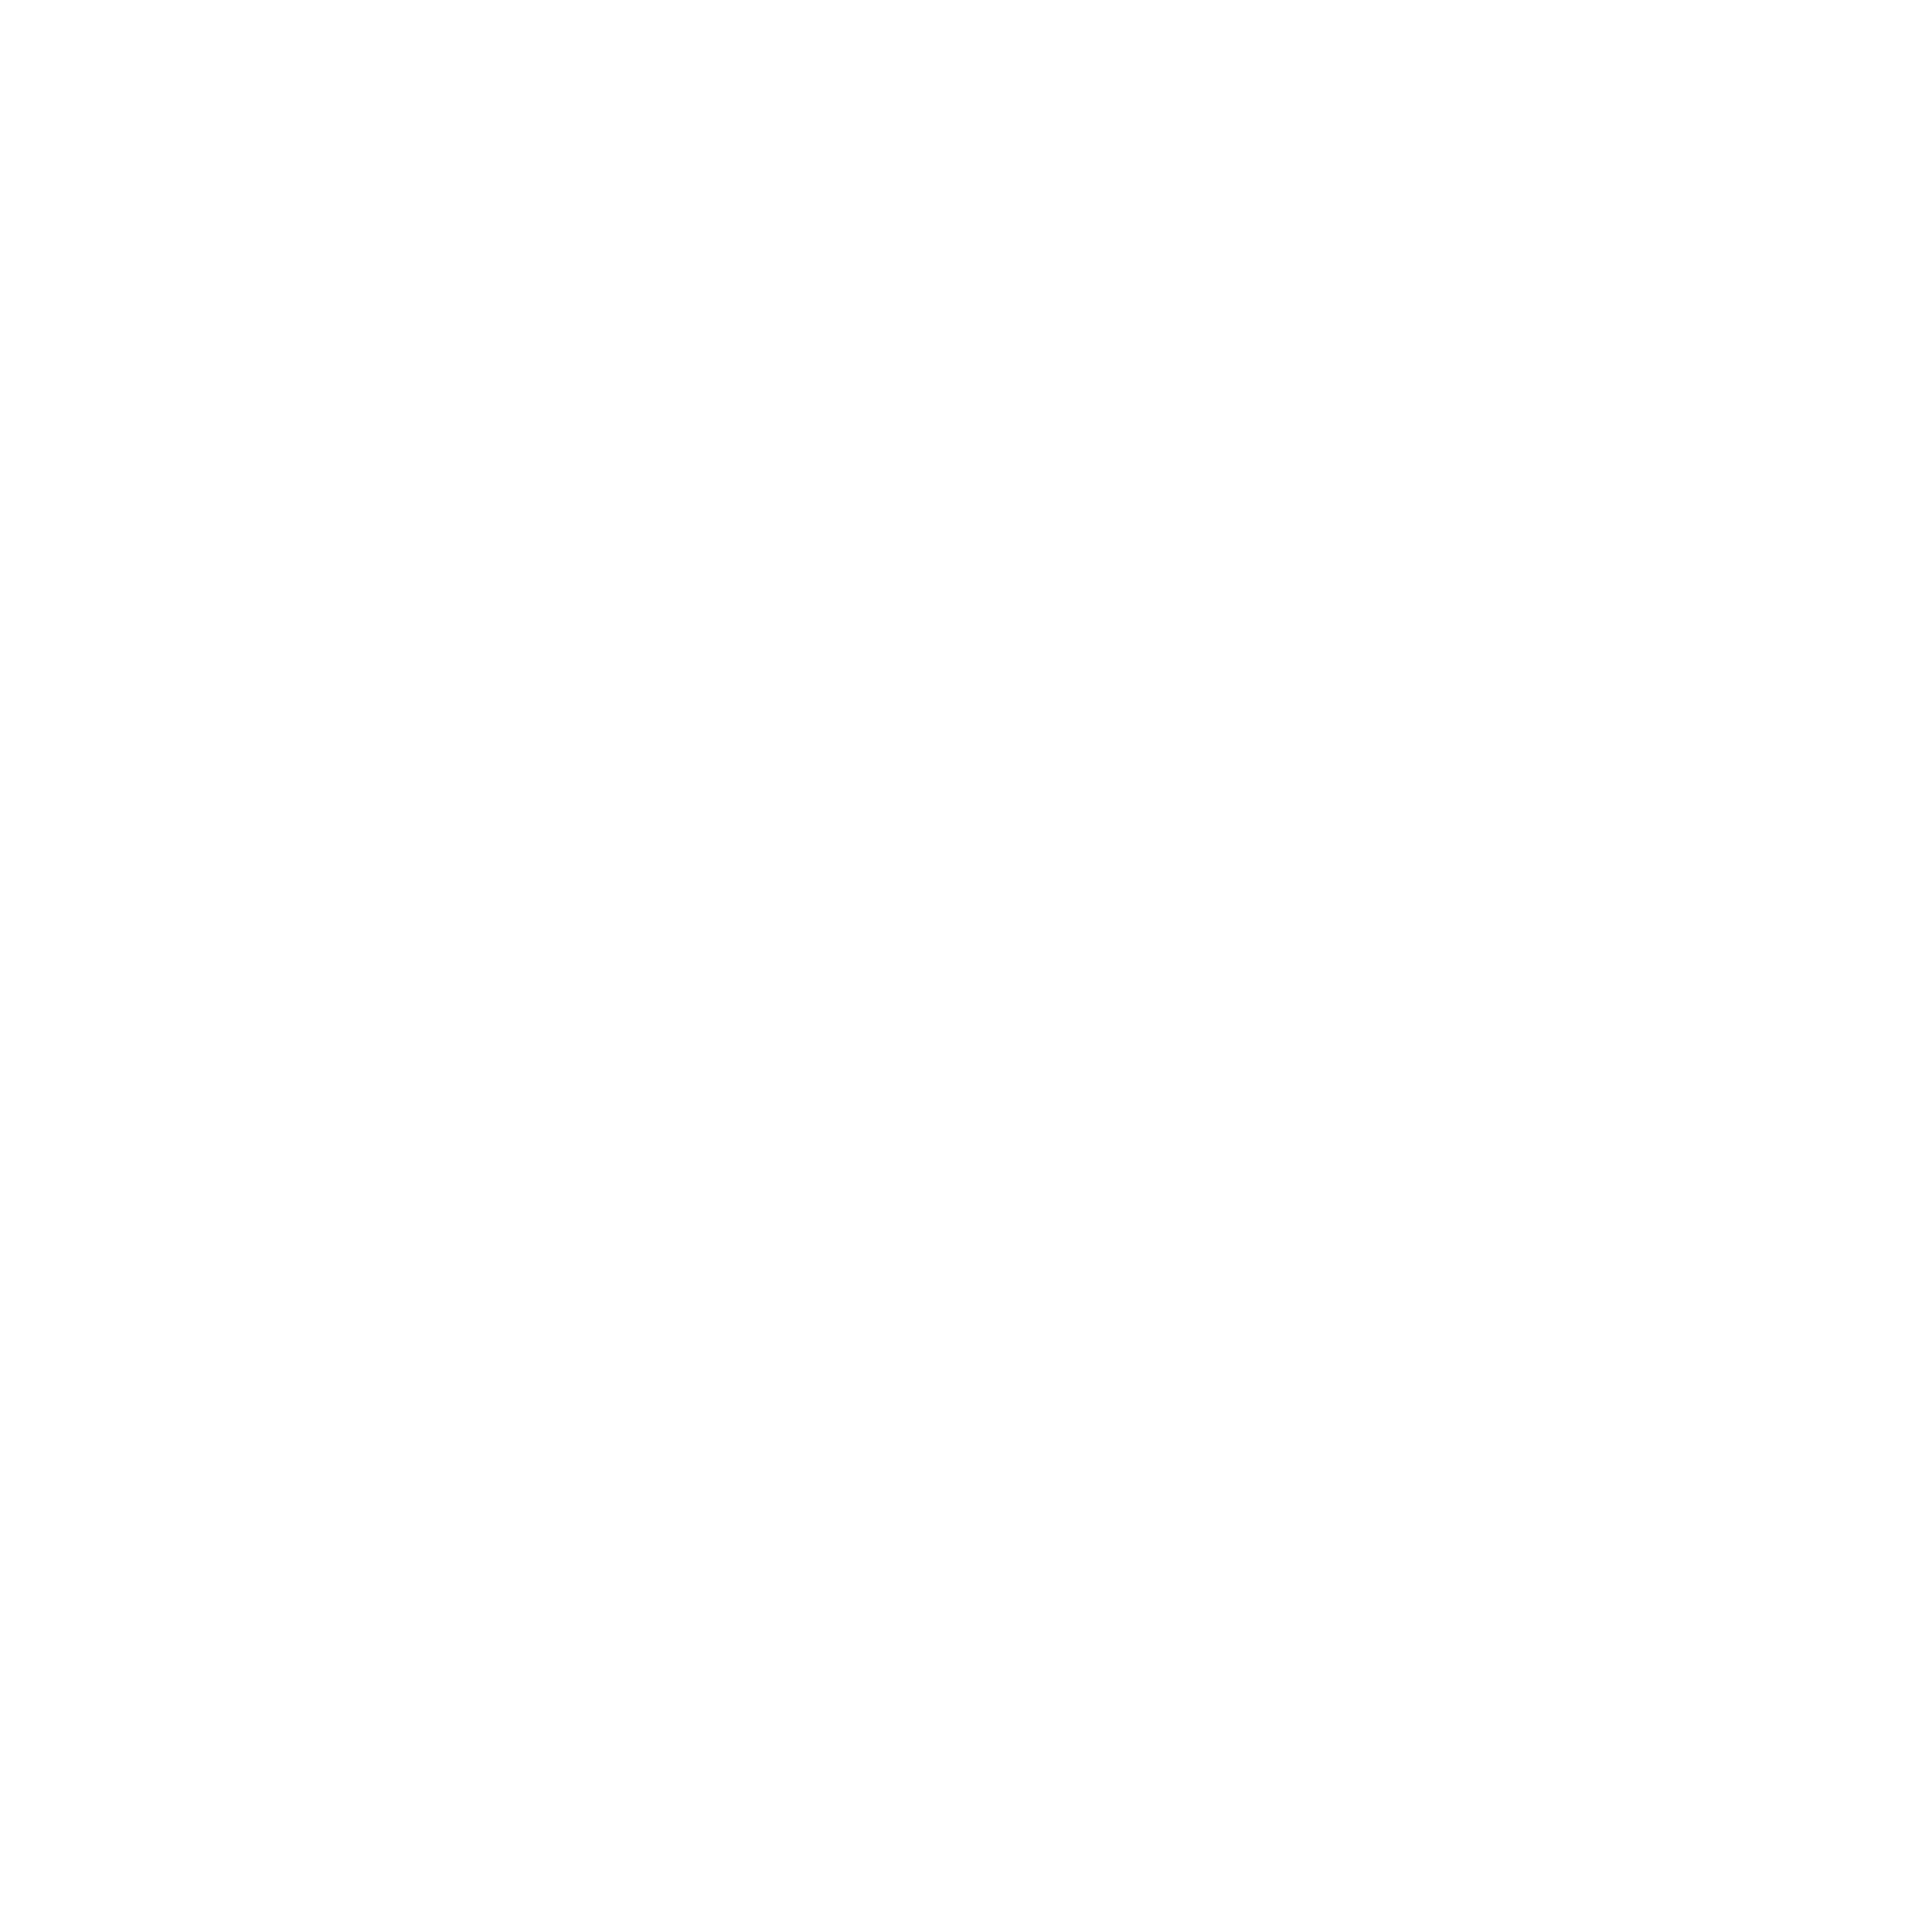 Plano de Saúde – Gato